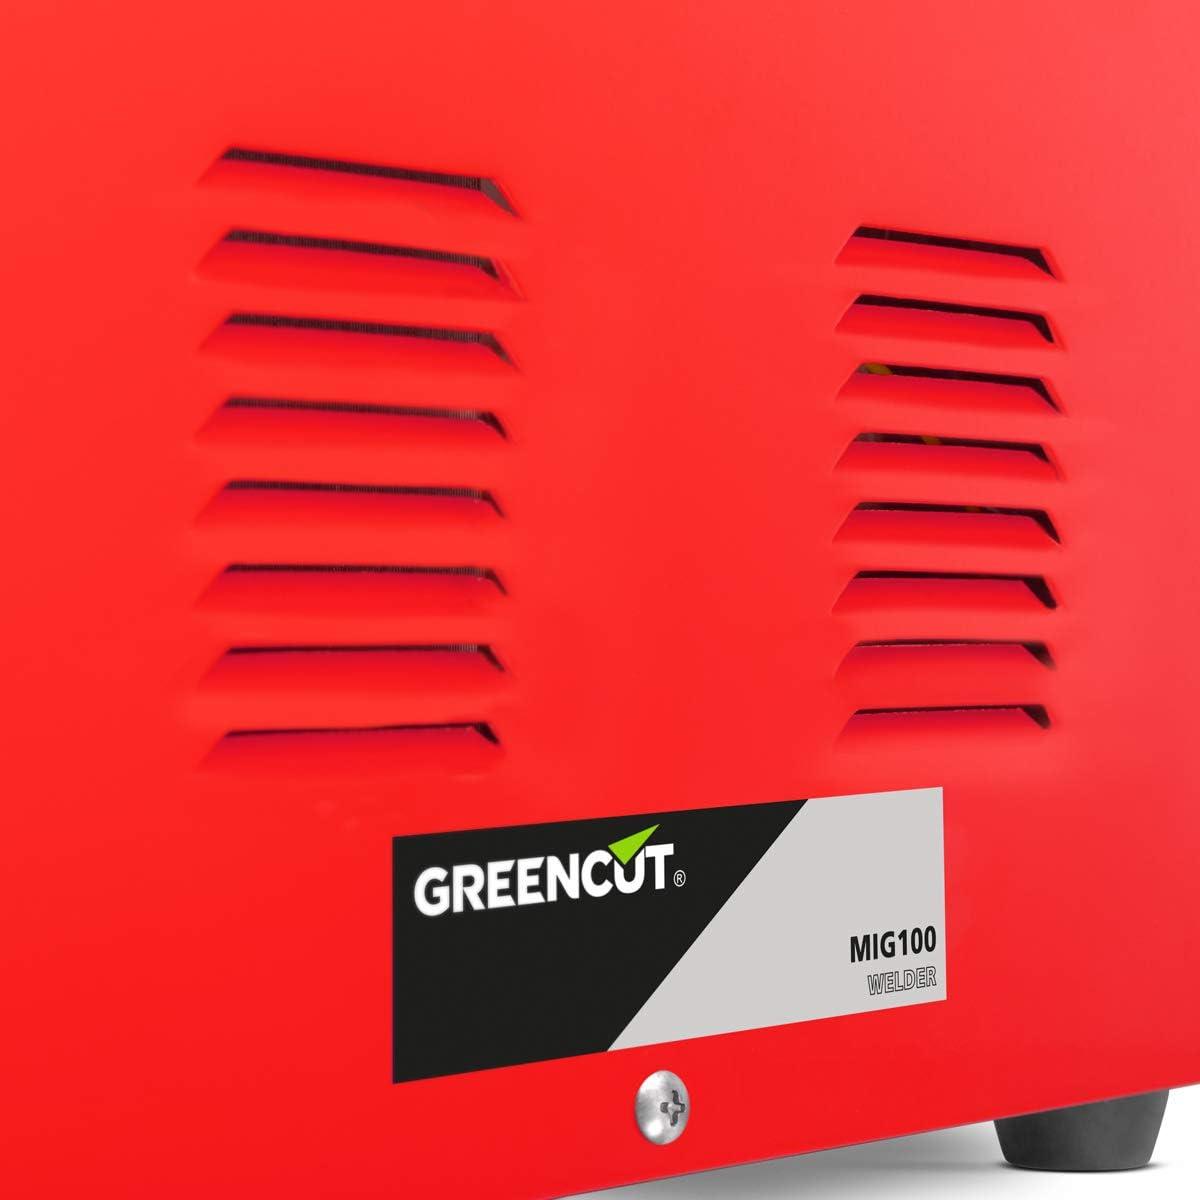 Greencut MIG-100 Poste a souder Inverter 120A Turbo-ventil/é Fil continu Orange